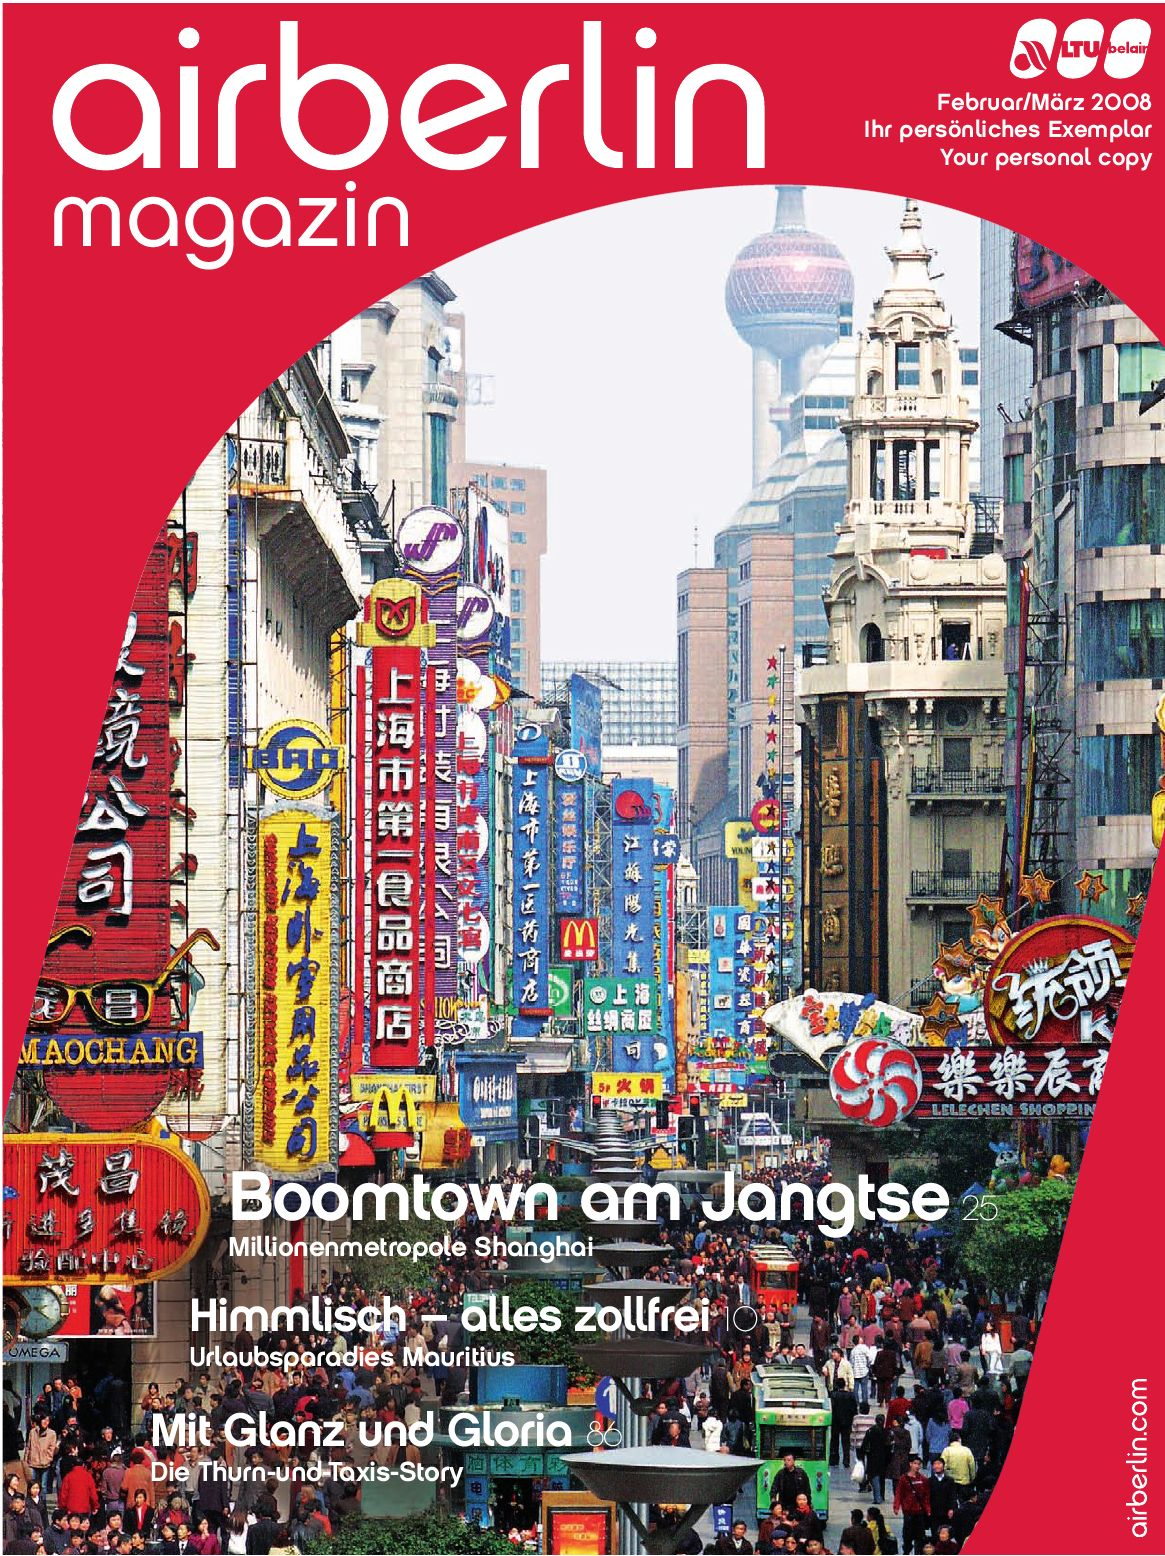 airberlin magazin 01/2008 by airberlin Airline - issuu